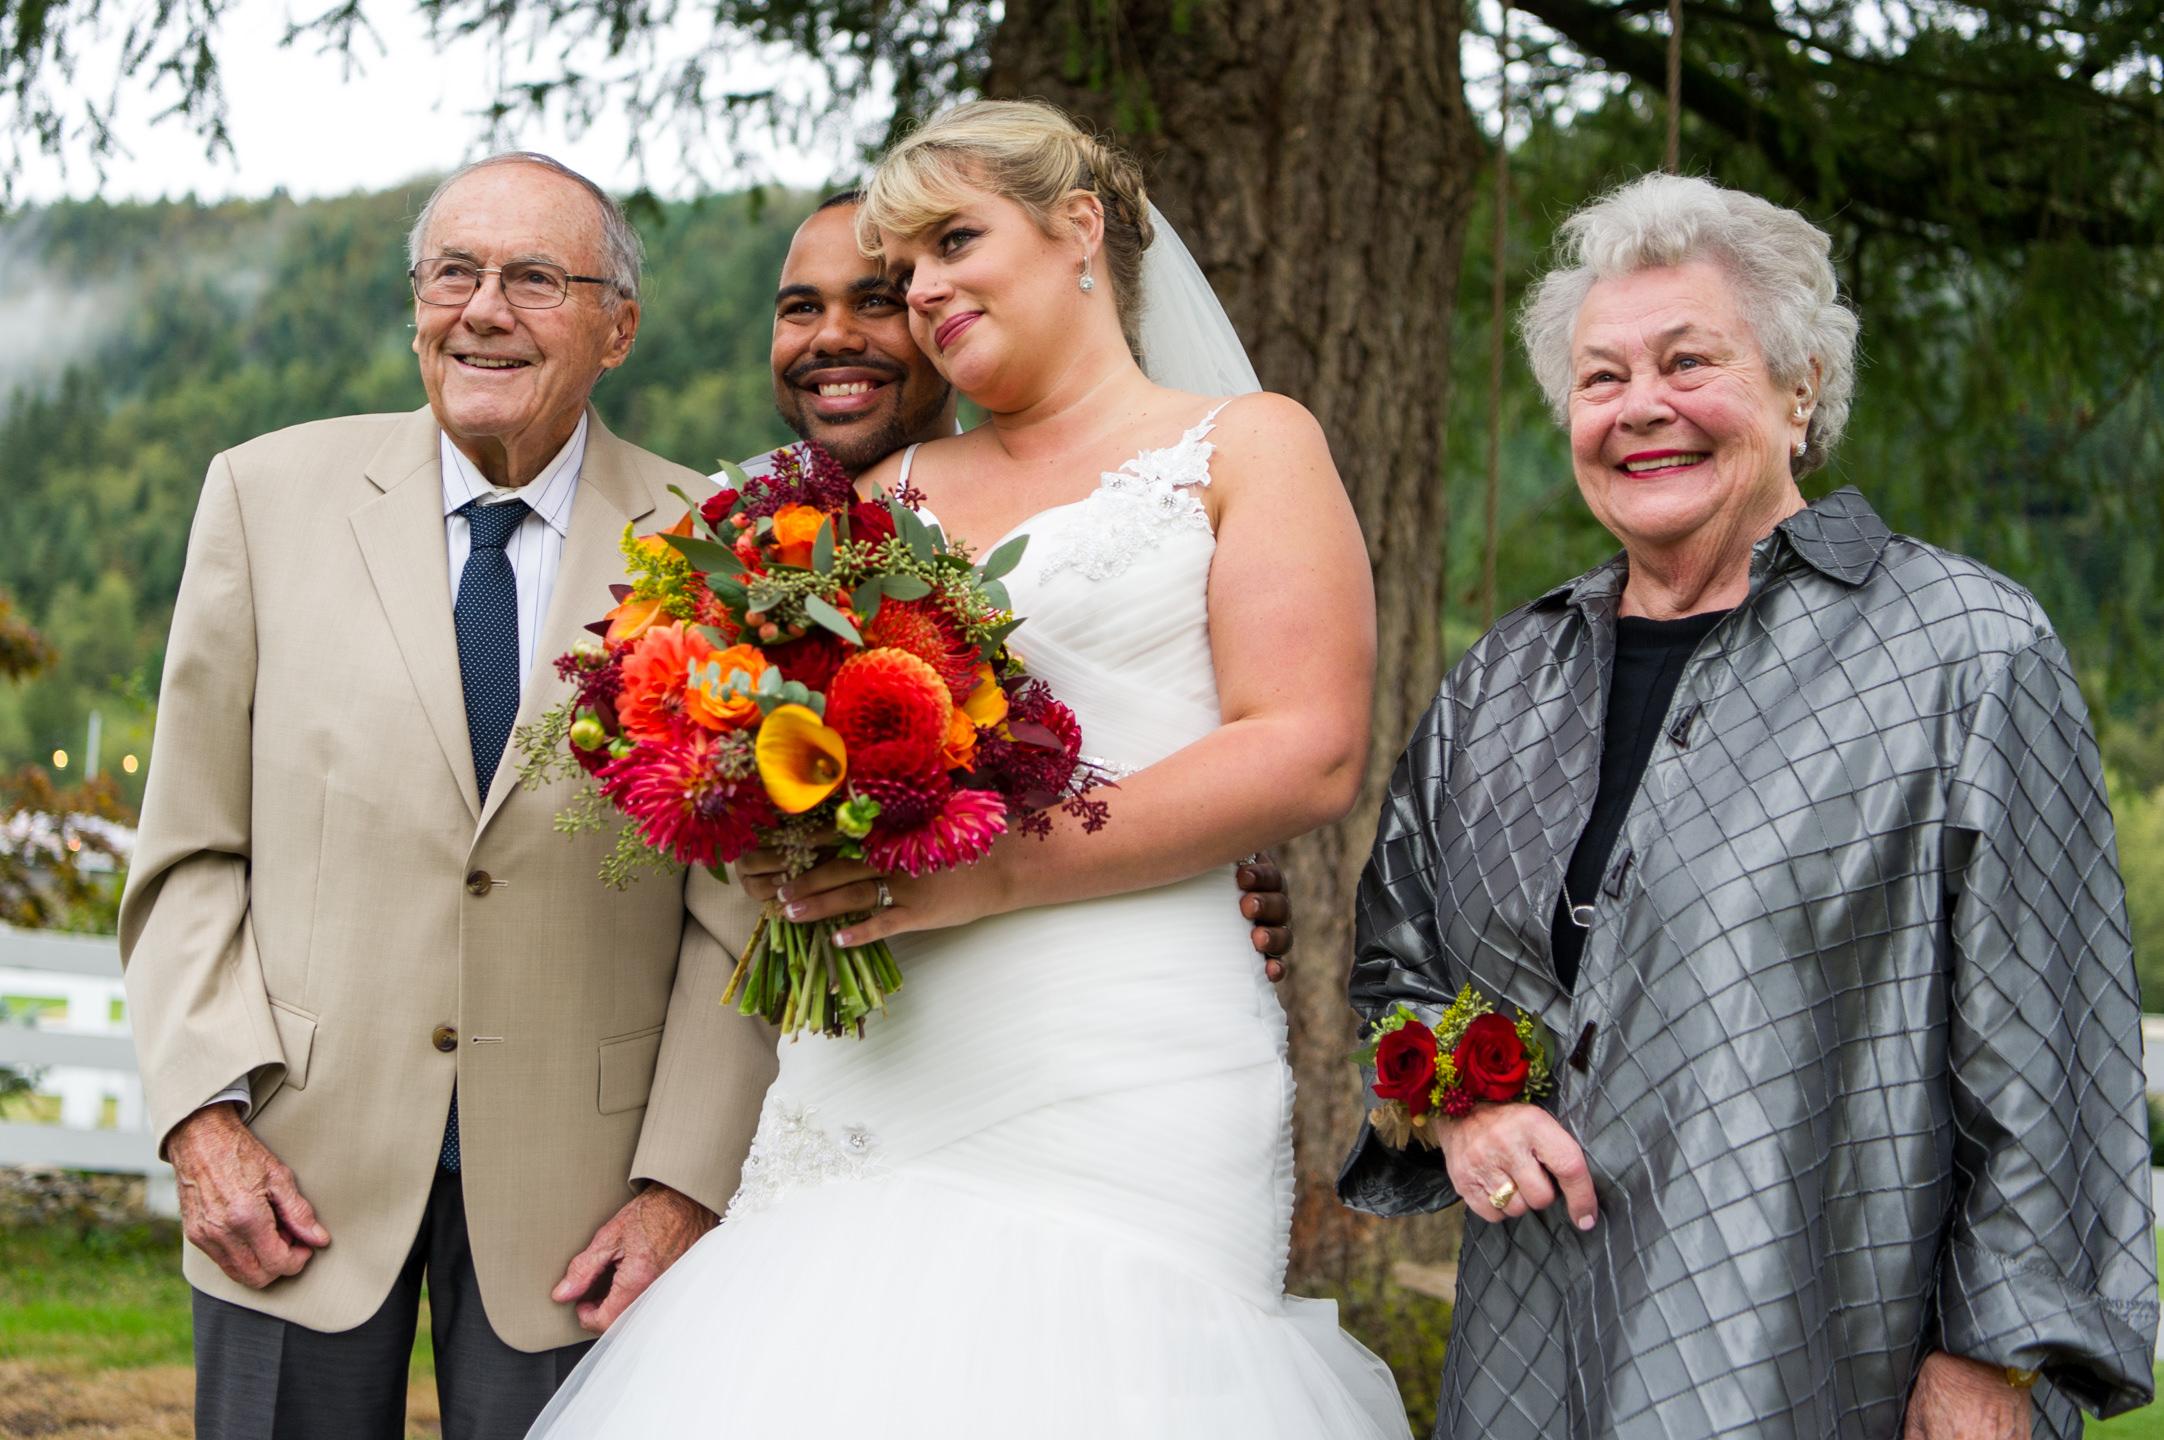 20160917_Tat_Renee and Marcus Wedding-59.jpg